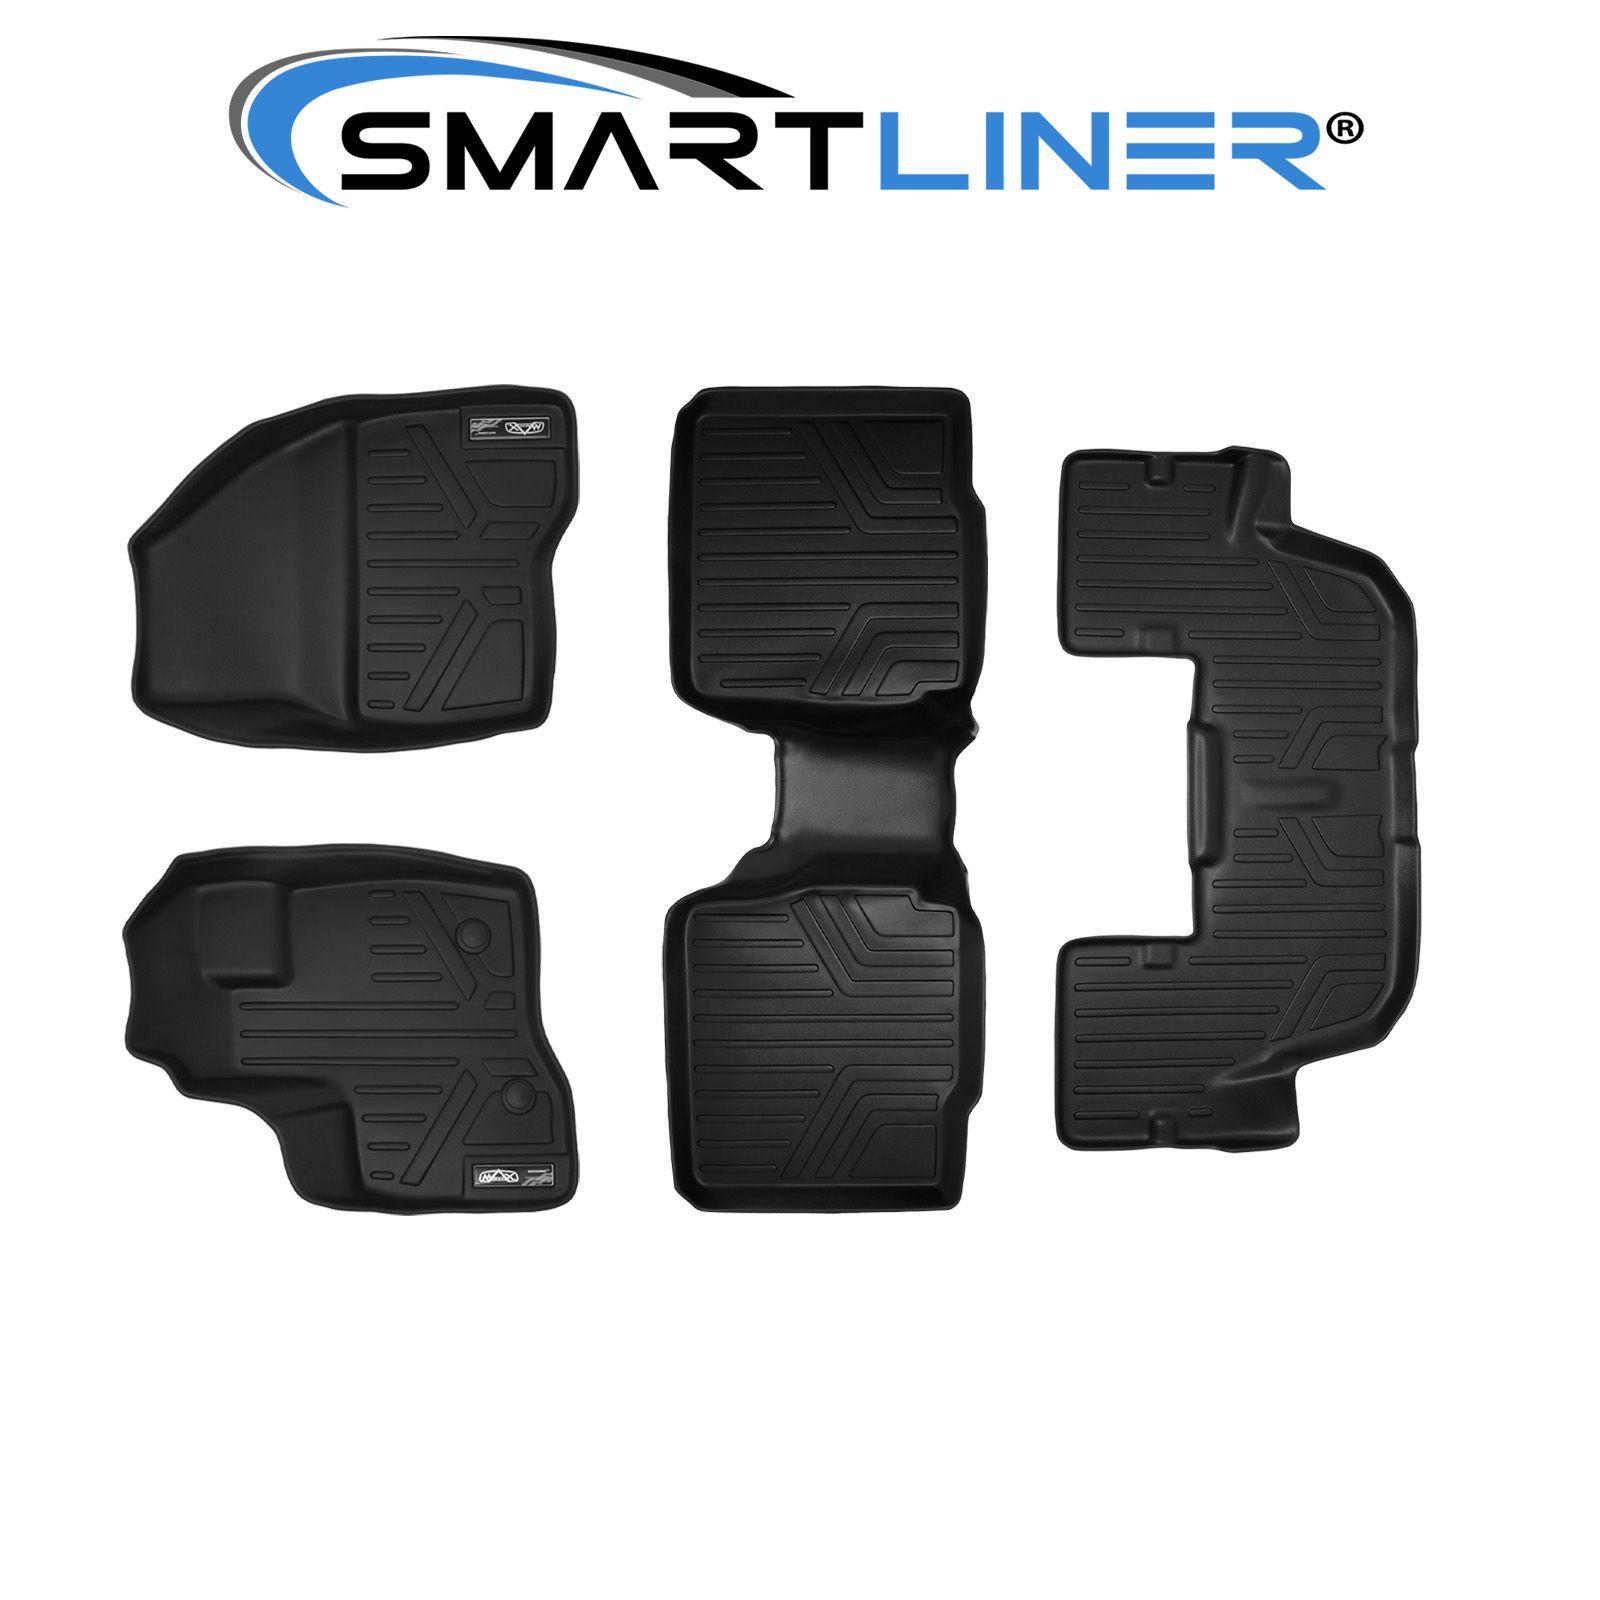 (Ad eBay) SMARTLINER All Weather Custom Floor Mats Liner